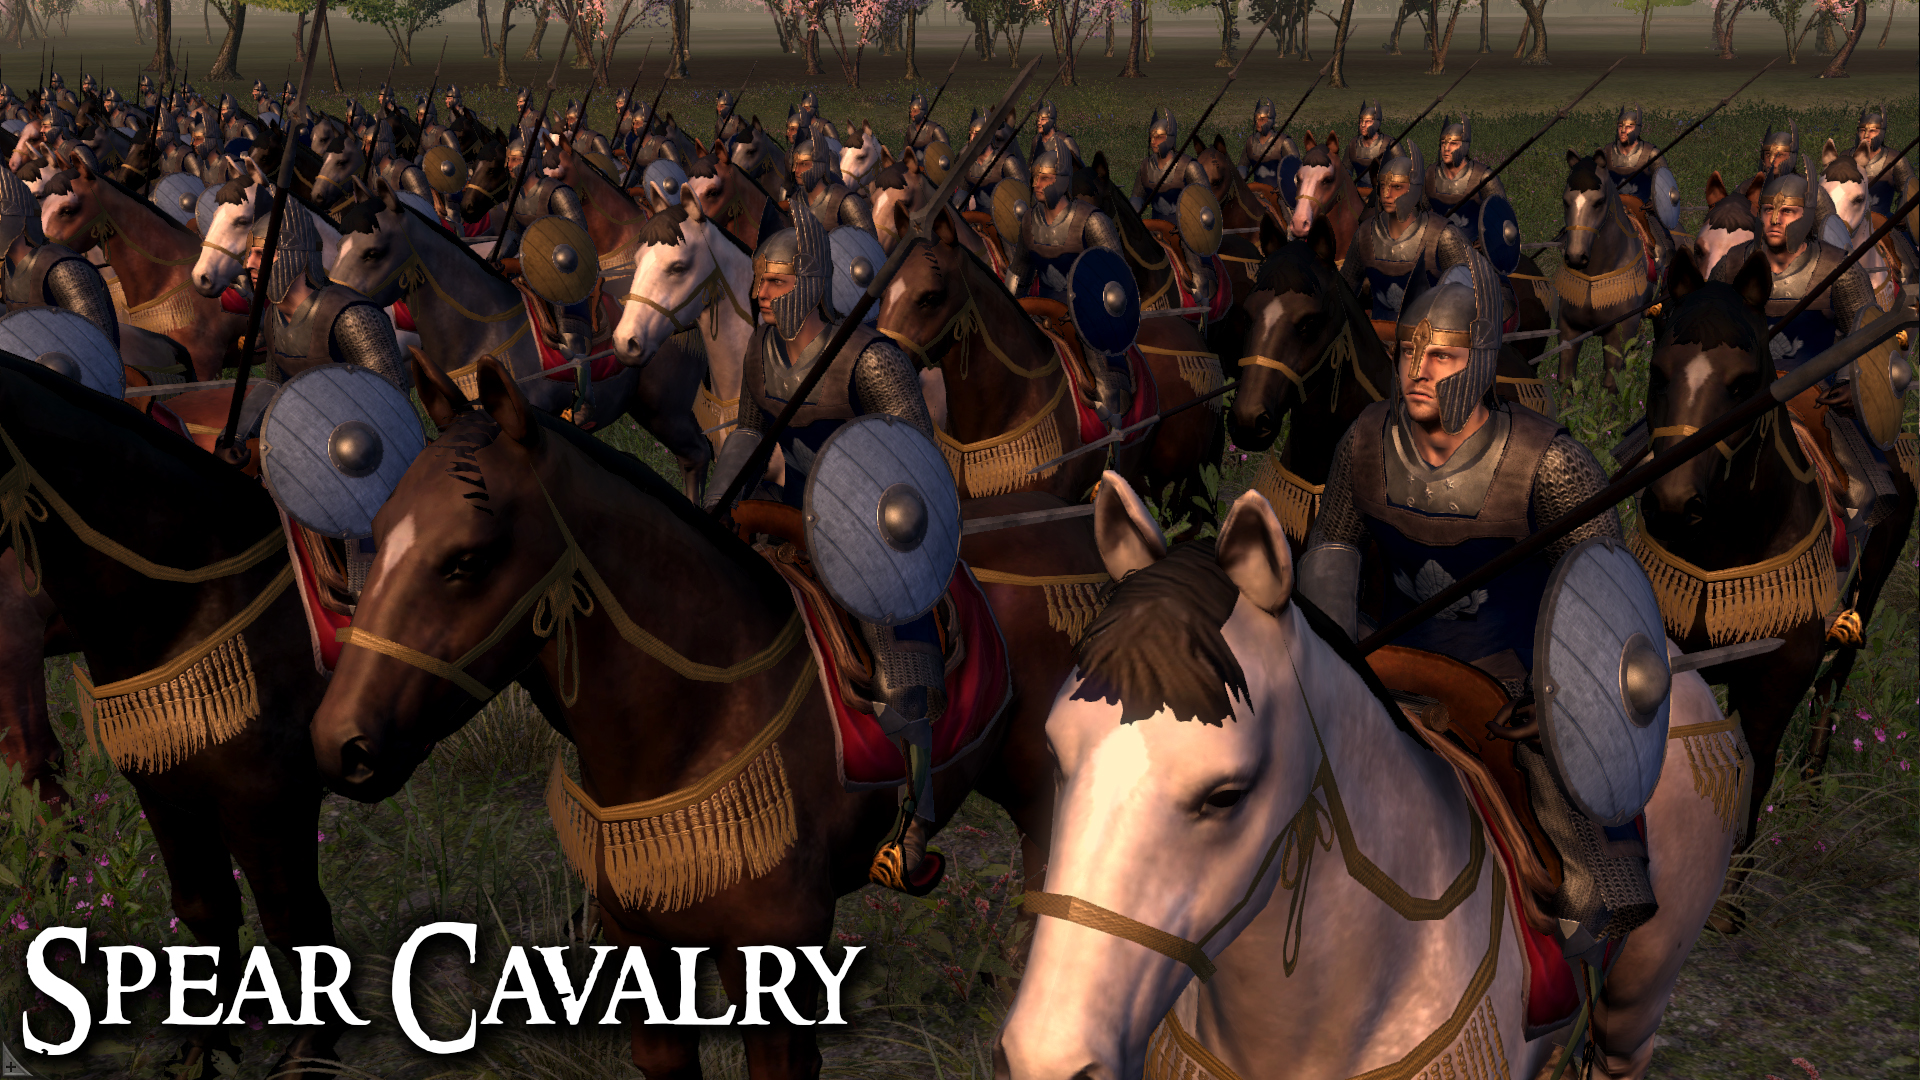 Spear Cavalry